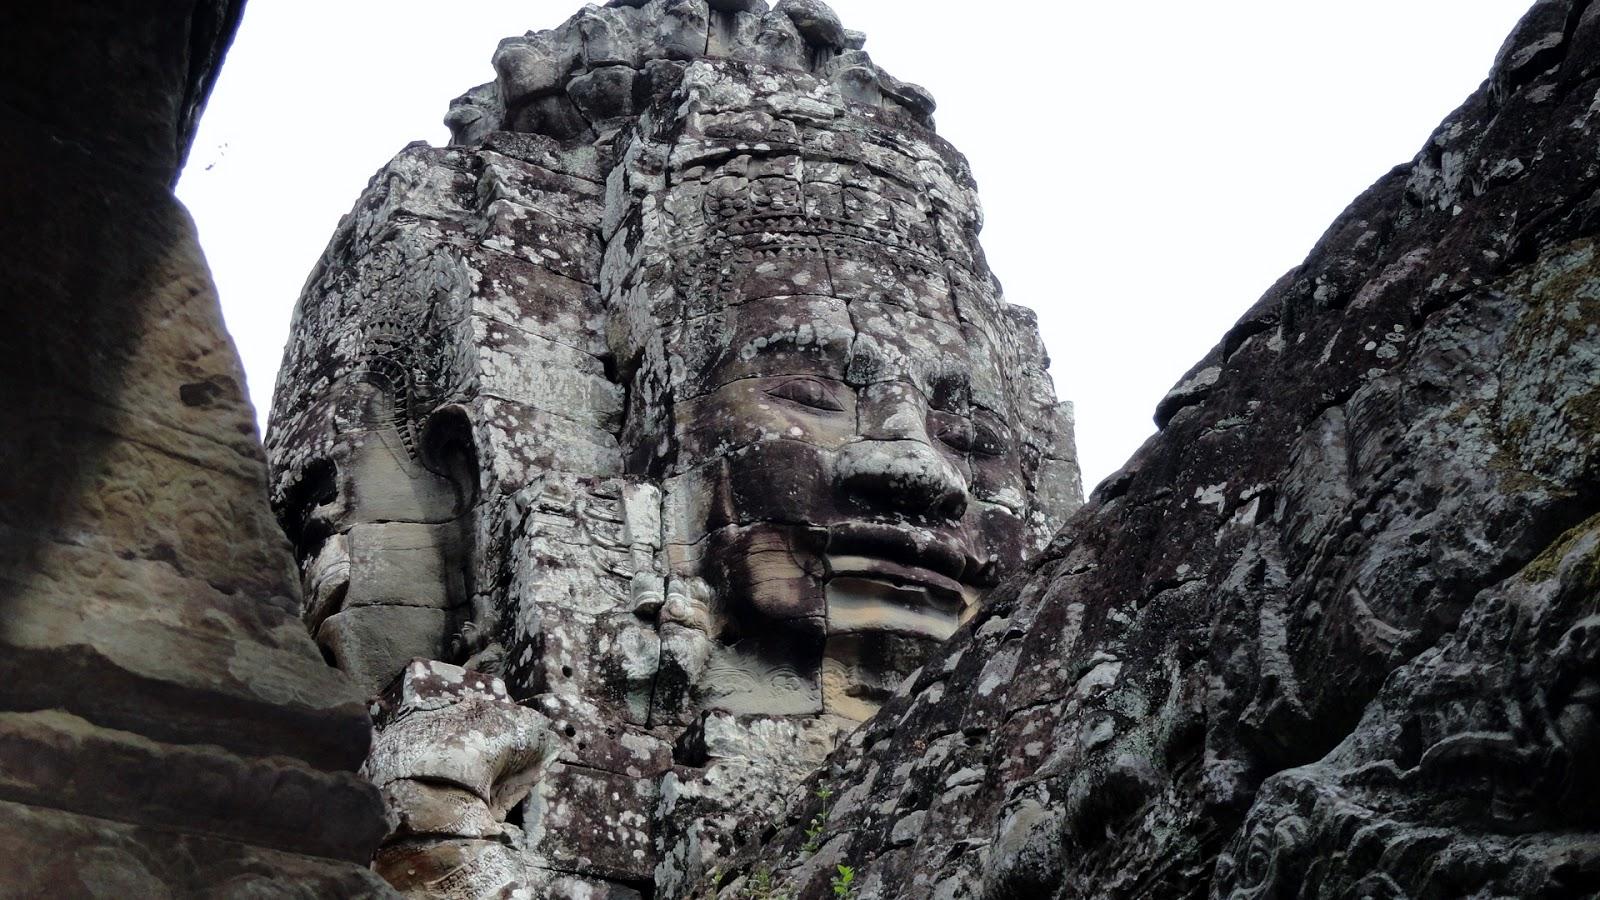 stone face falling apart